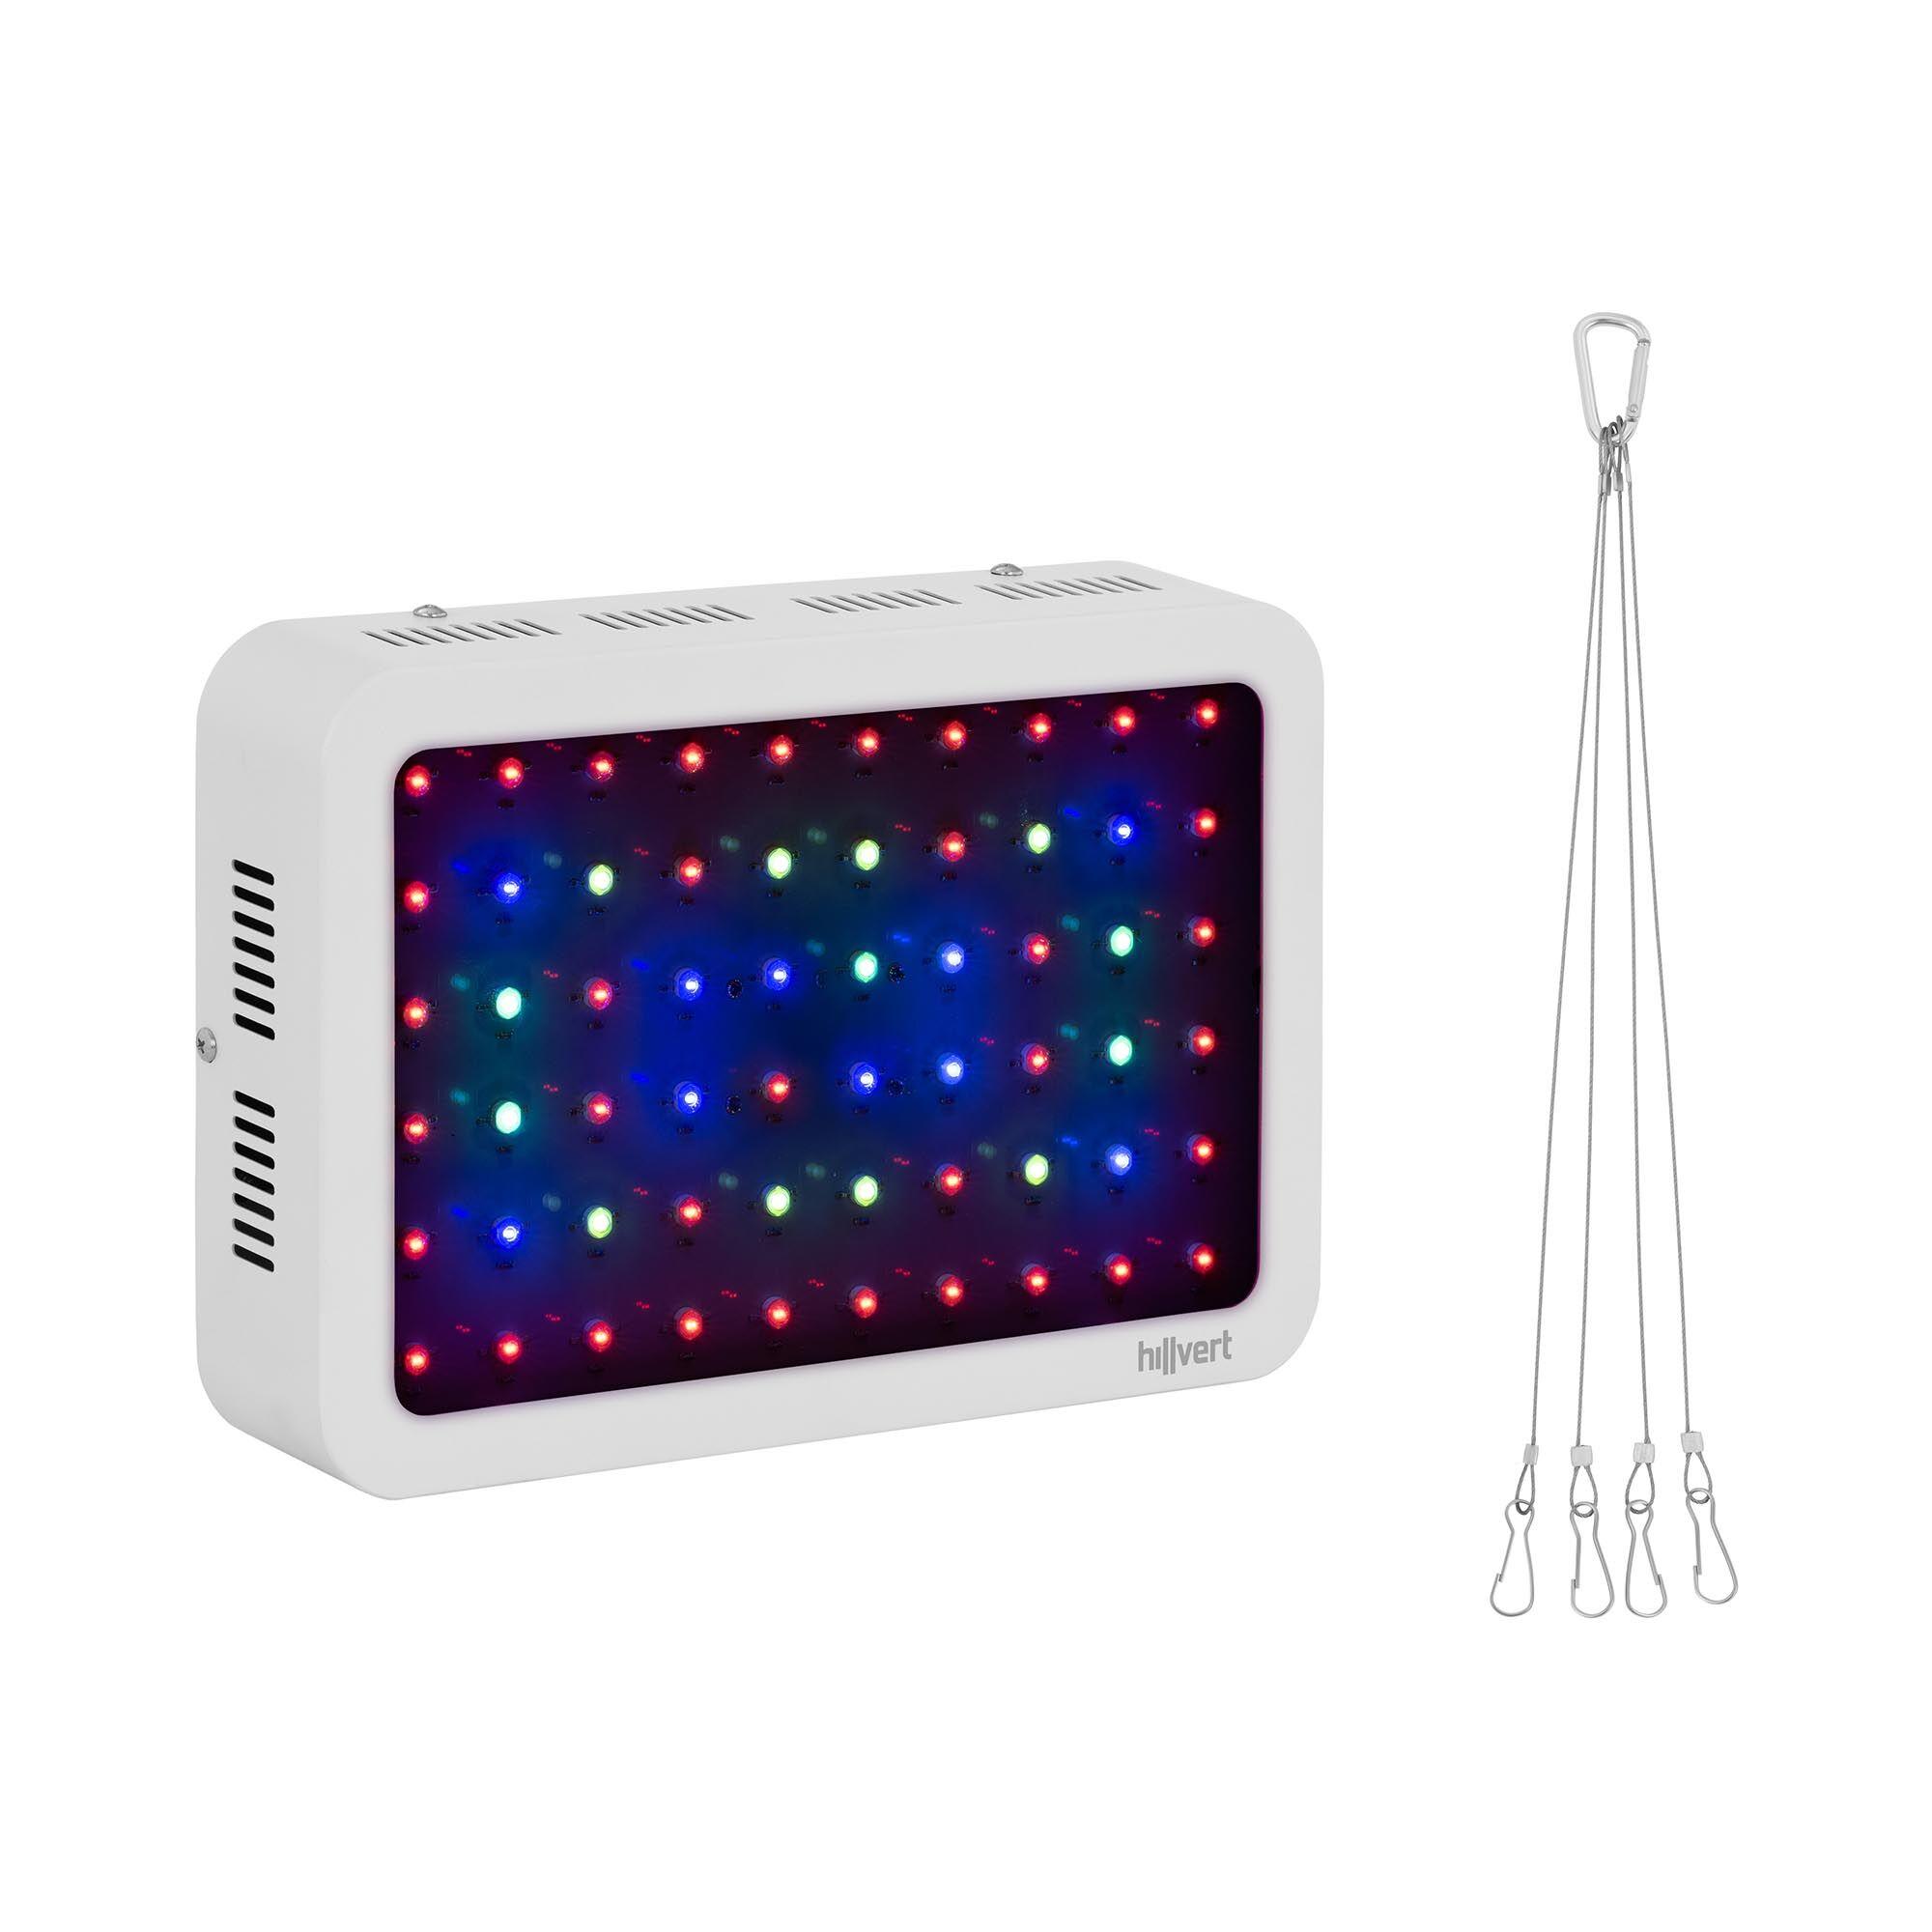 hillvert LED vekstlys - 600 W - 3,913 lumen